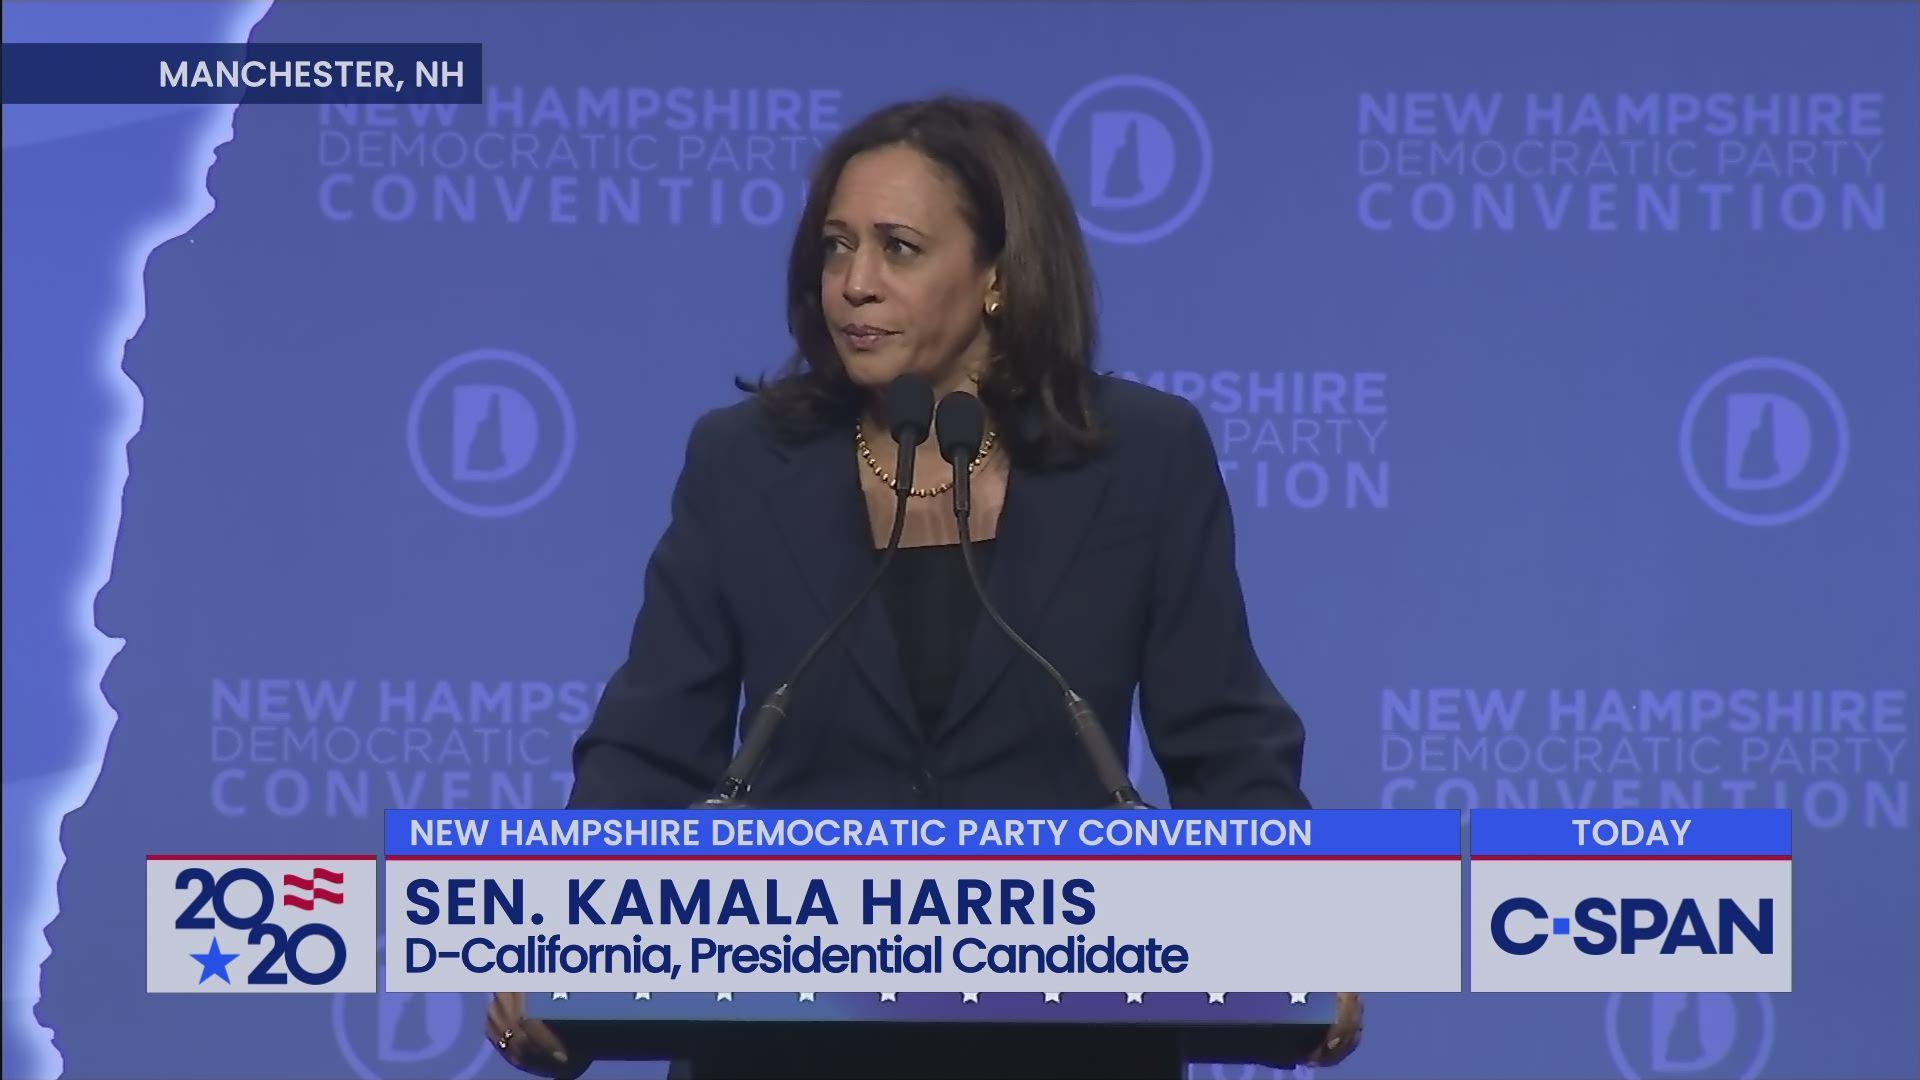 Senator Harris At New Hampshire Democratic Party Convention C Span Org